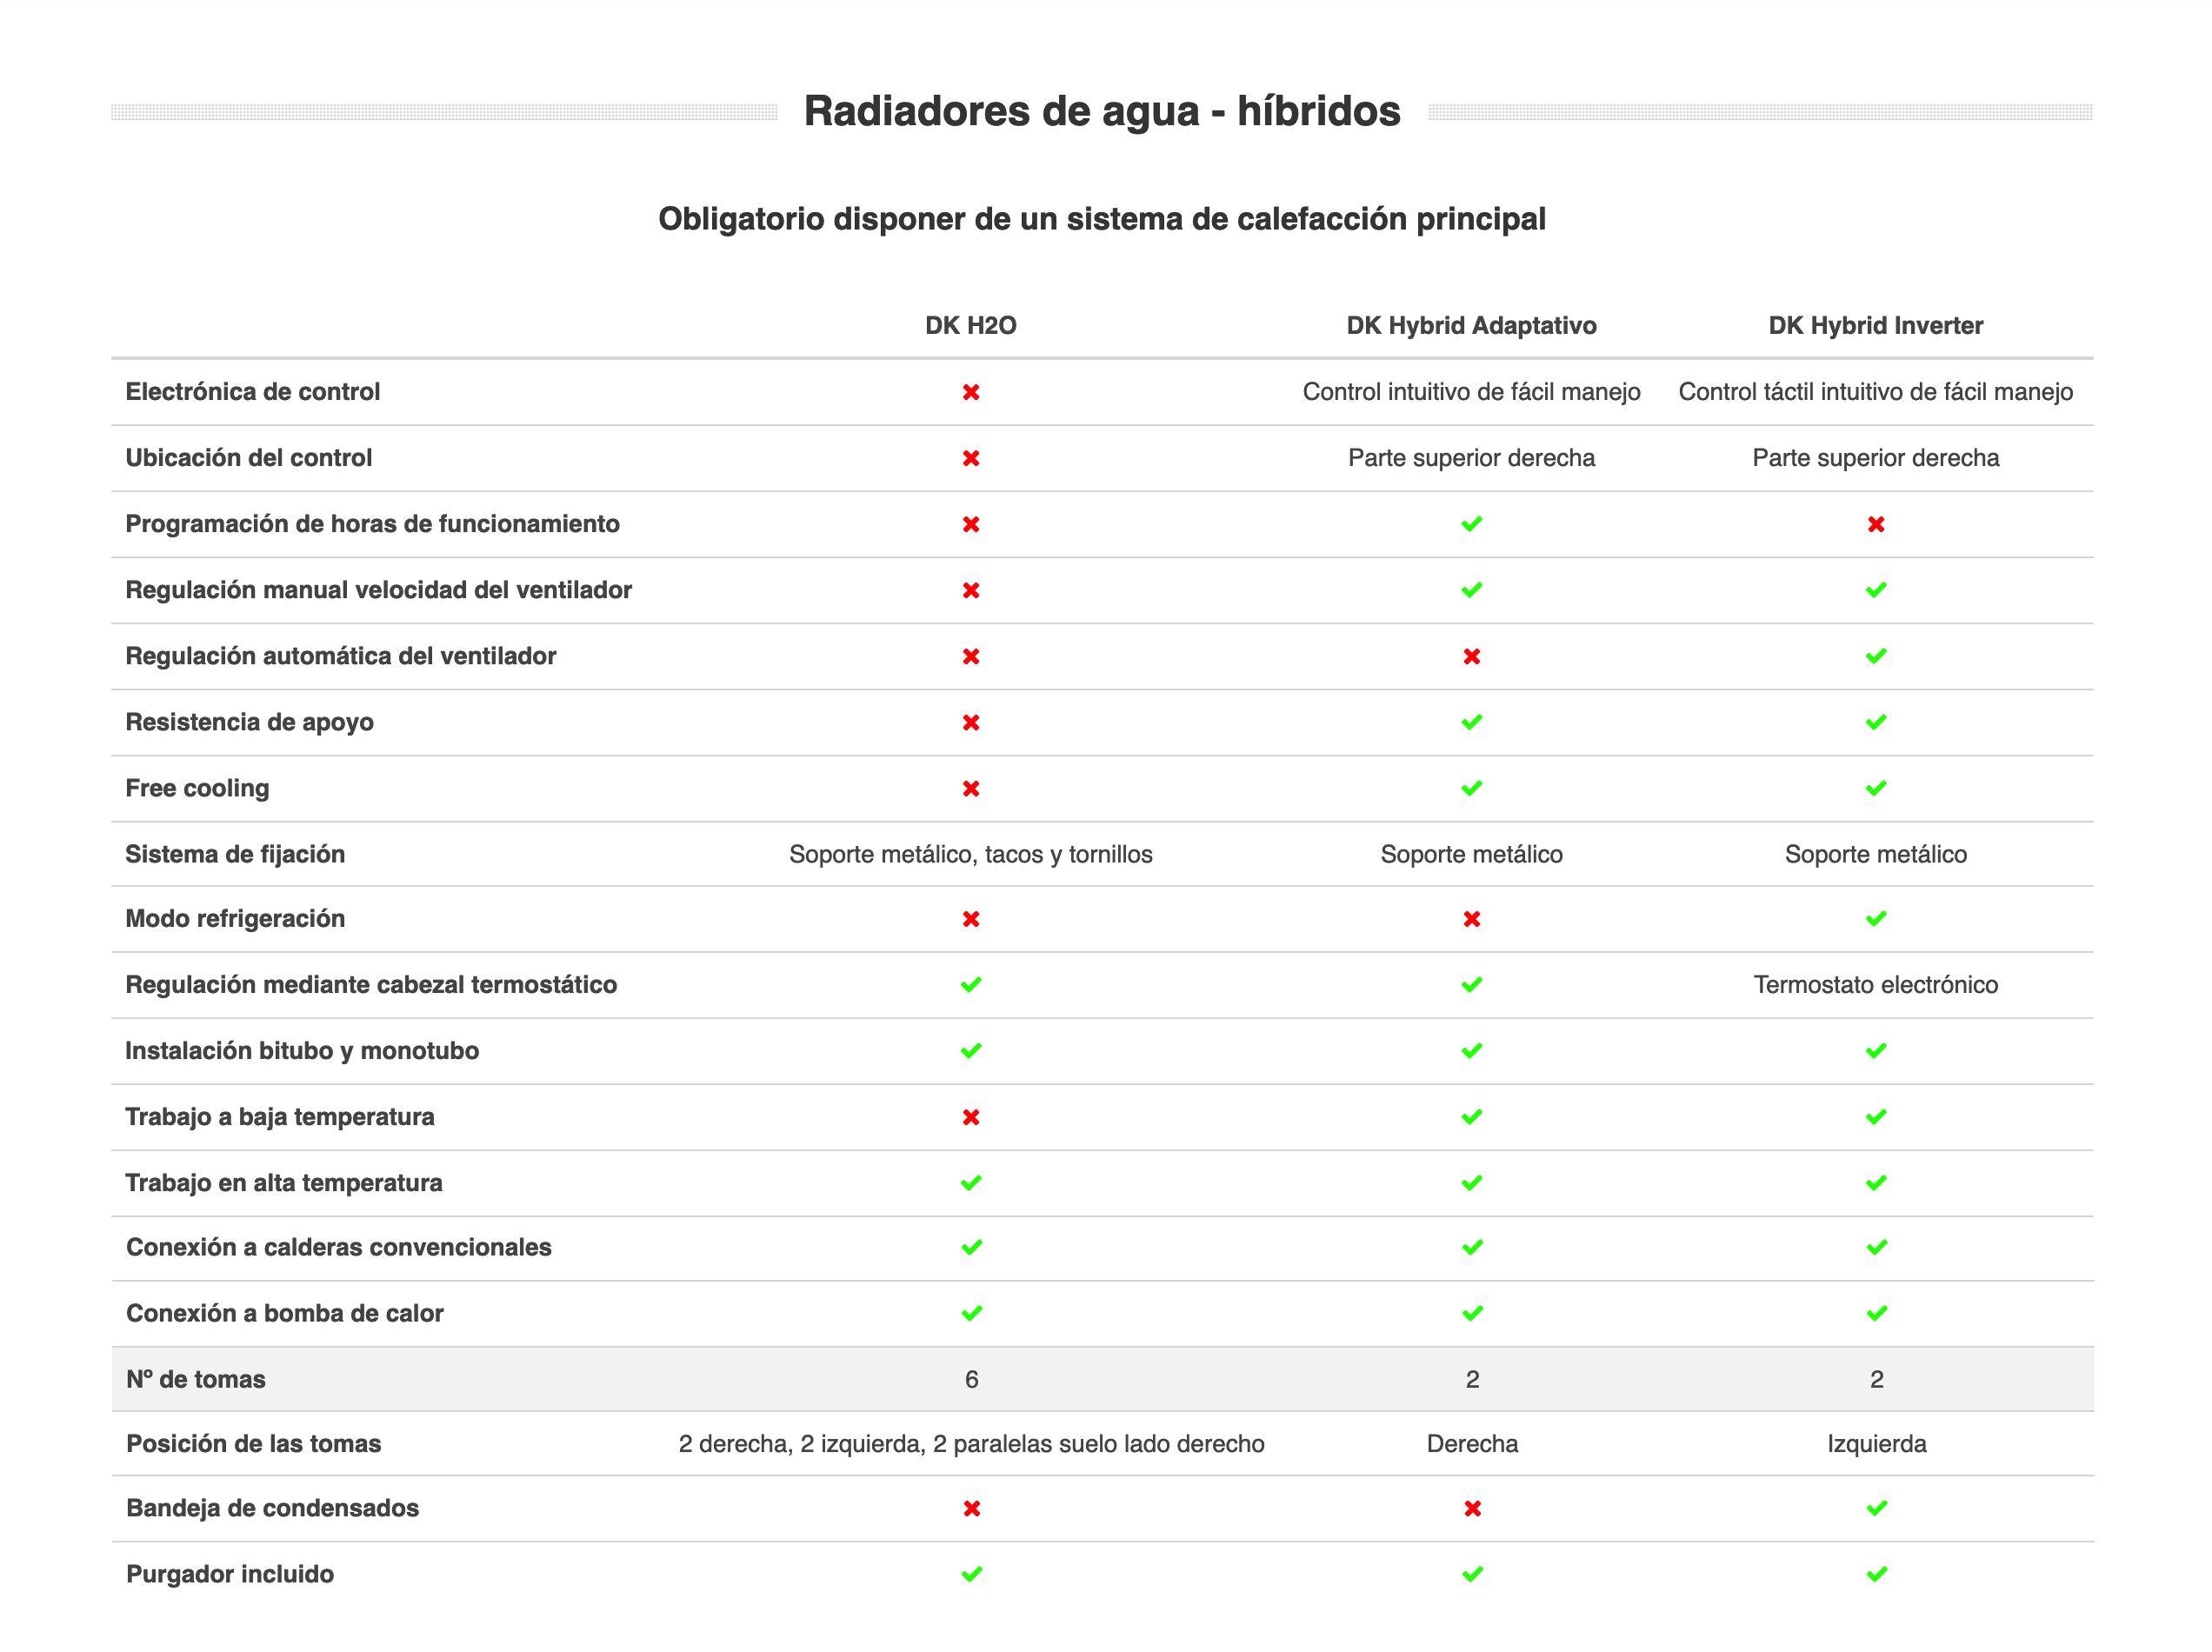 Tabla comparativa de radiadores de agua Climastar